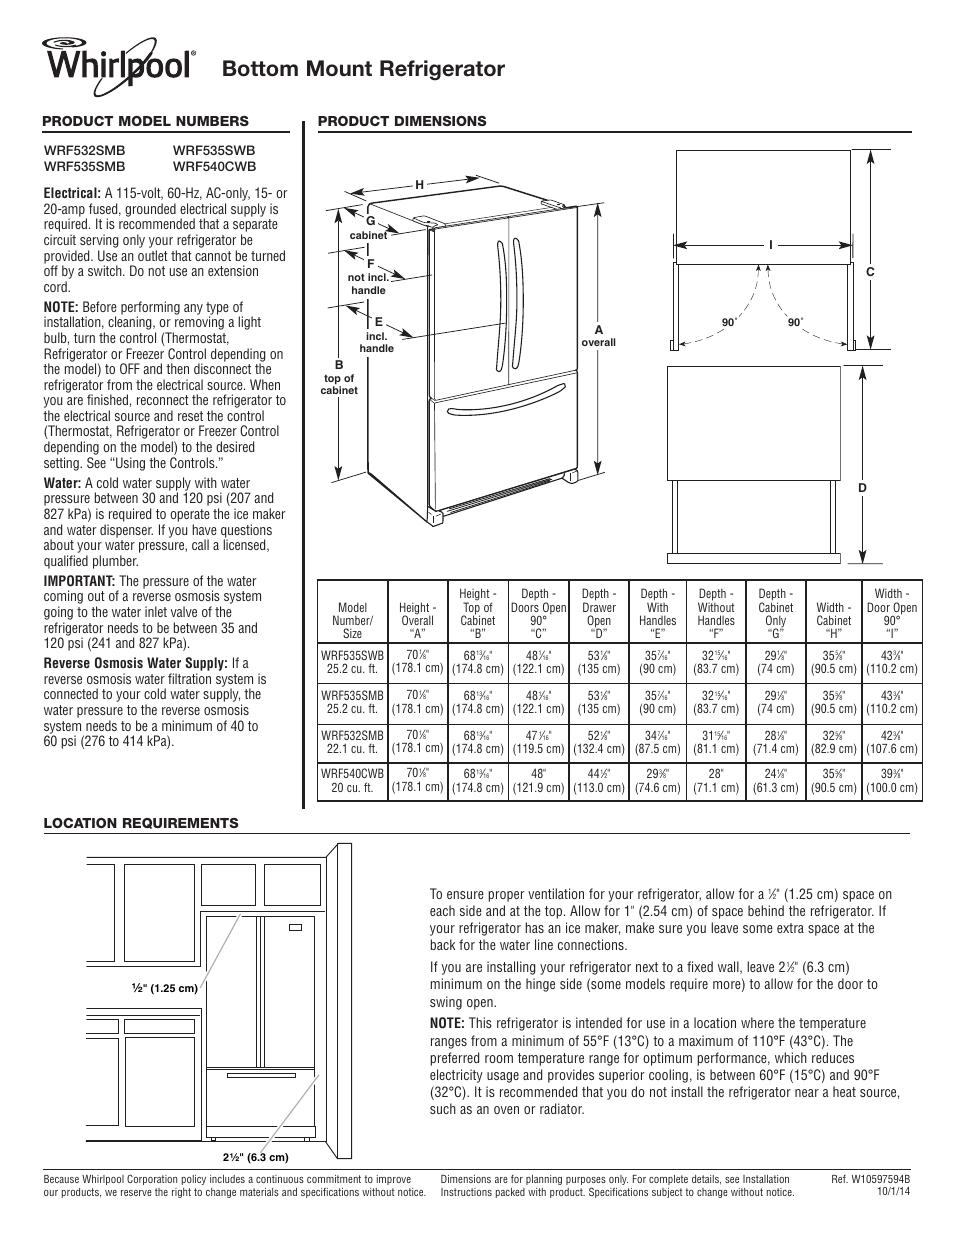 whirlpool refrigerator wiring diagram pdf